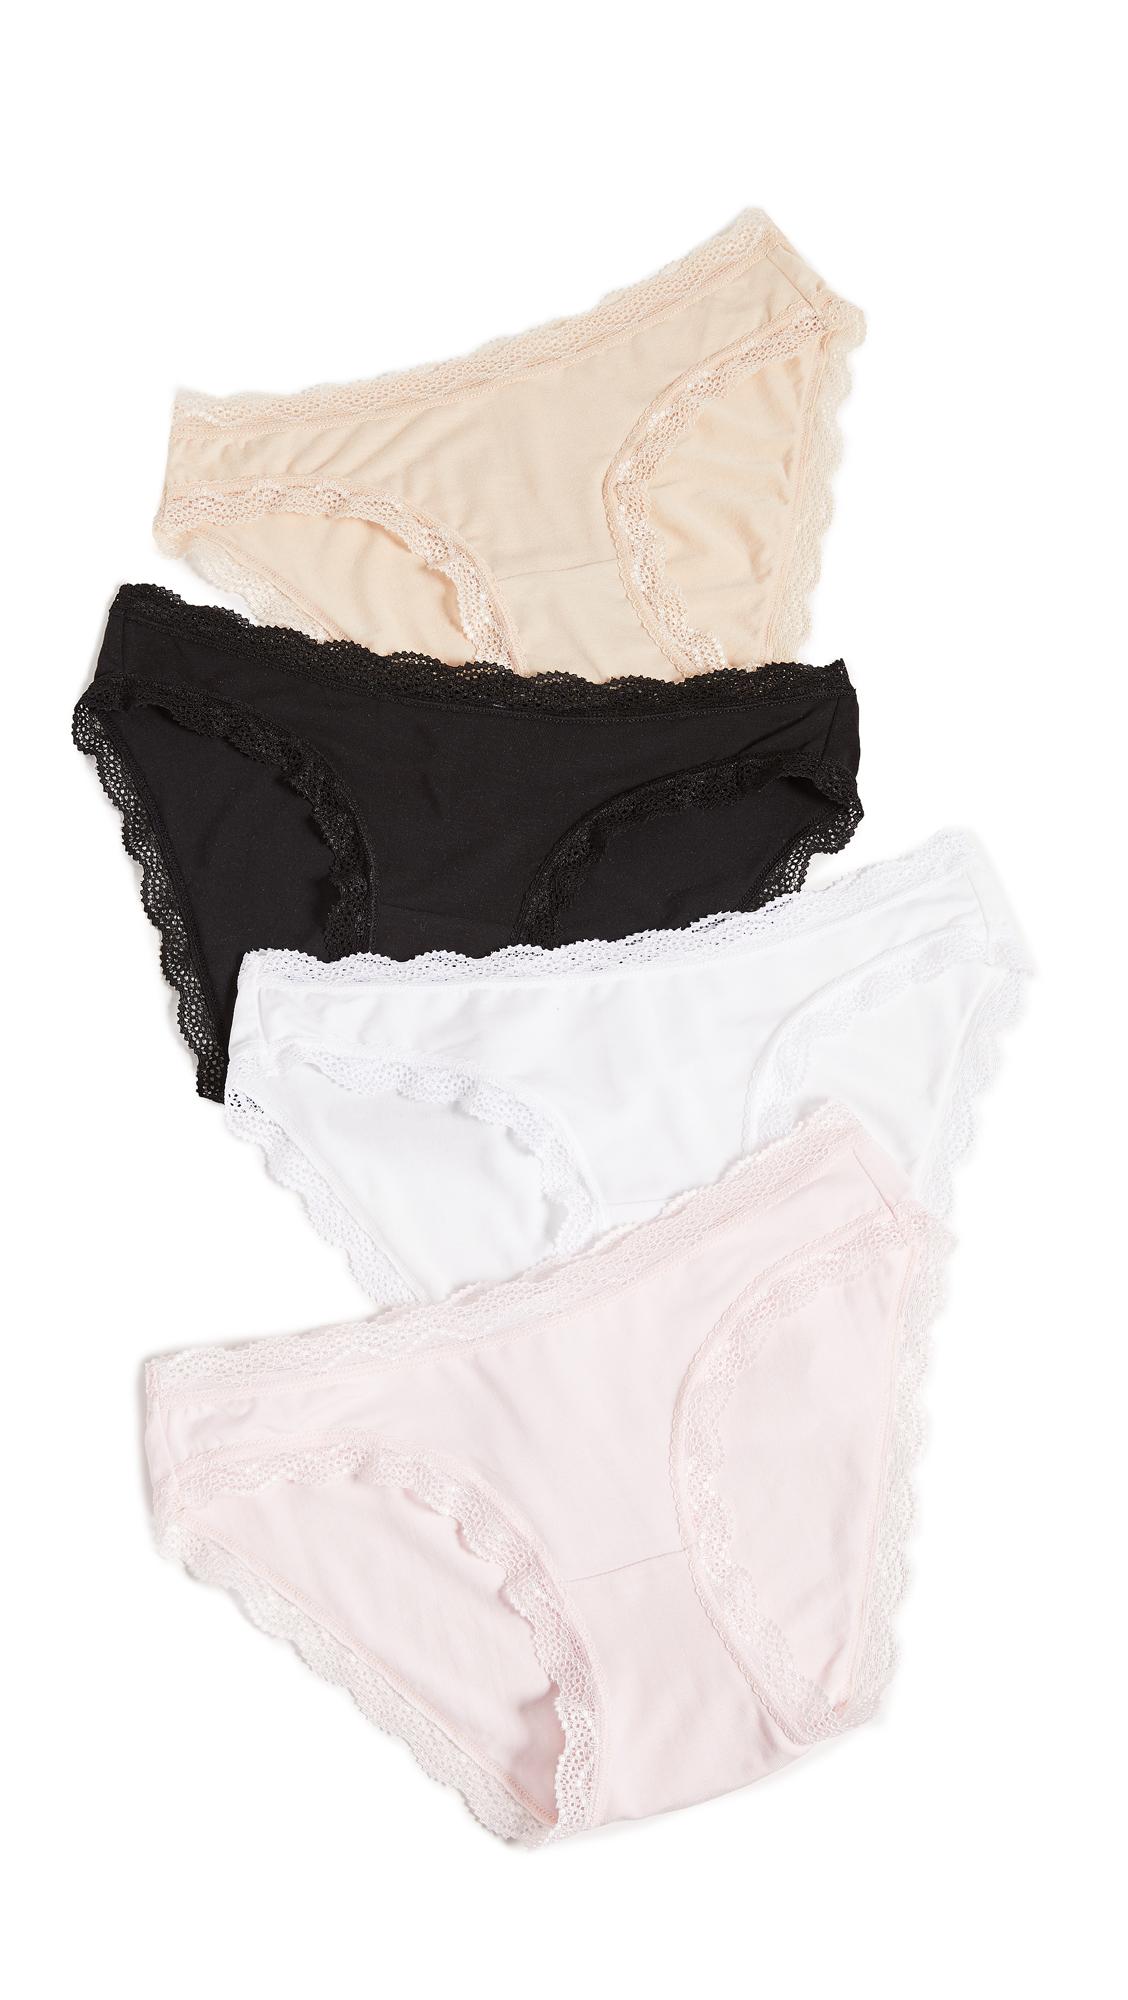 Stripe & Stare Basics Bikini Briefs 4 Pack